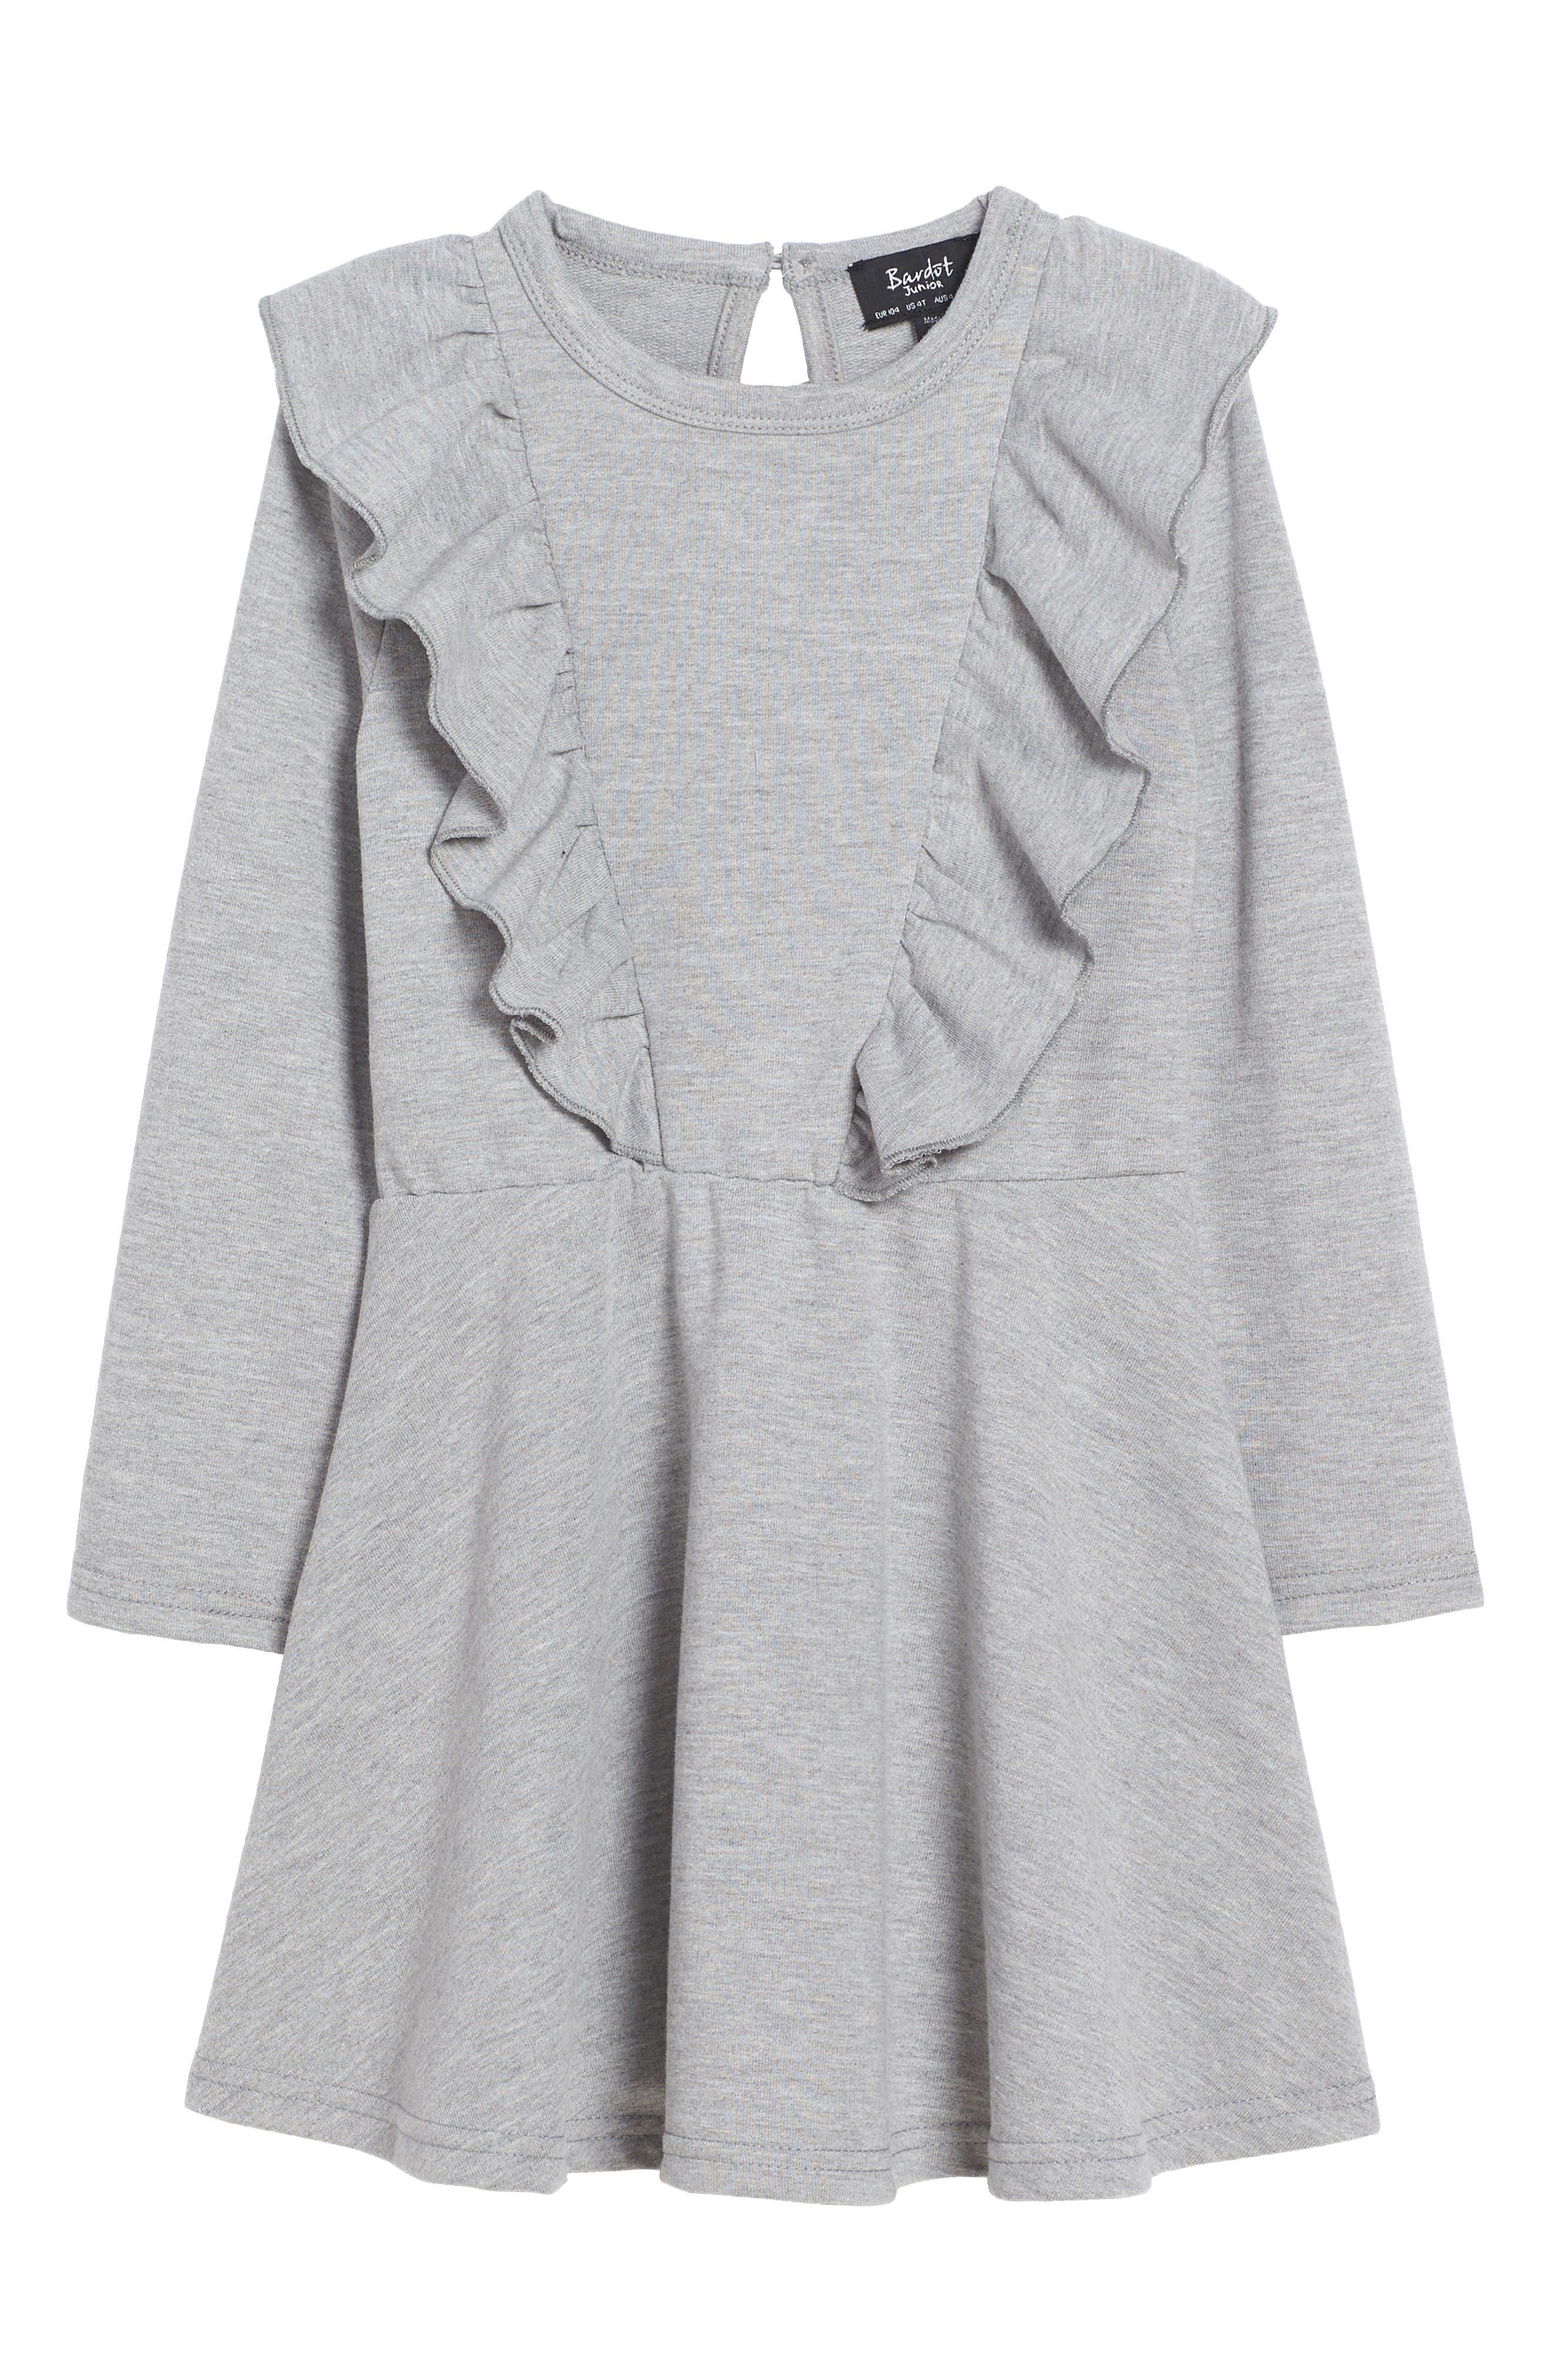 Frill of It Ruffle Dress,                             Main thumbnail 1, color,                             Grey Marble